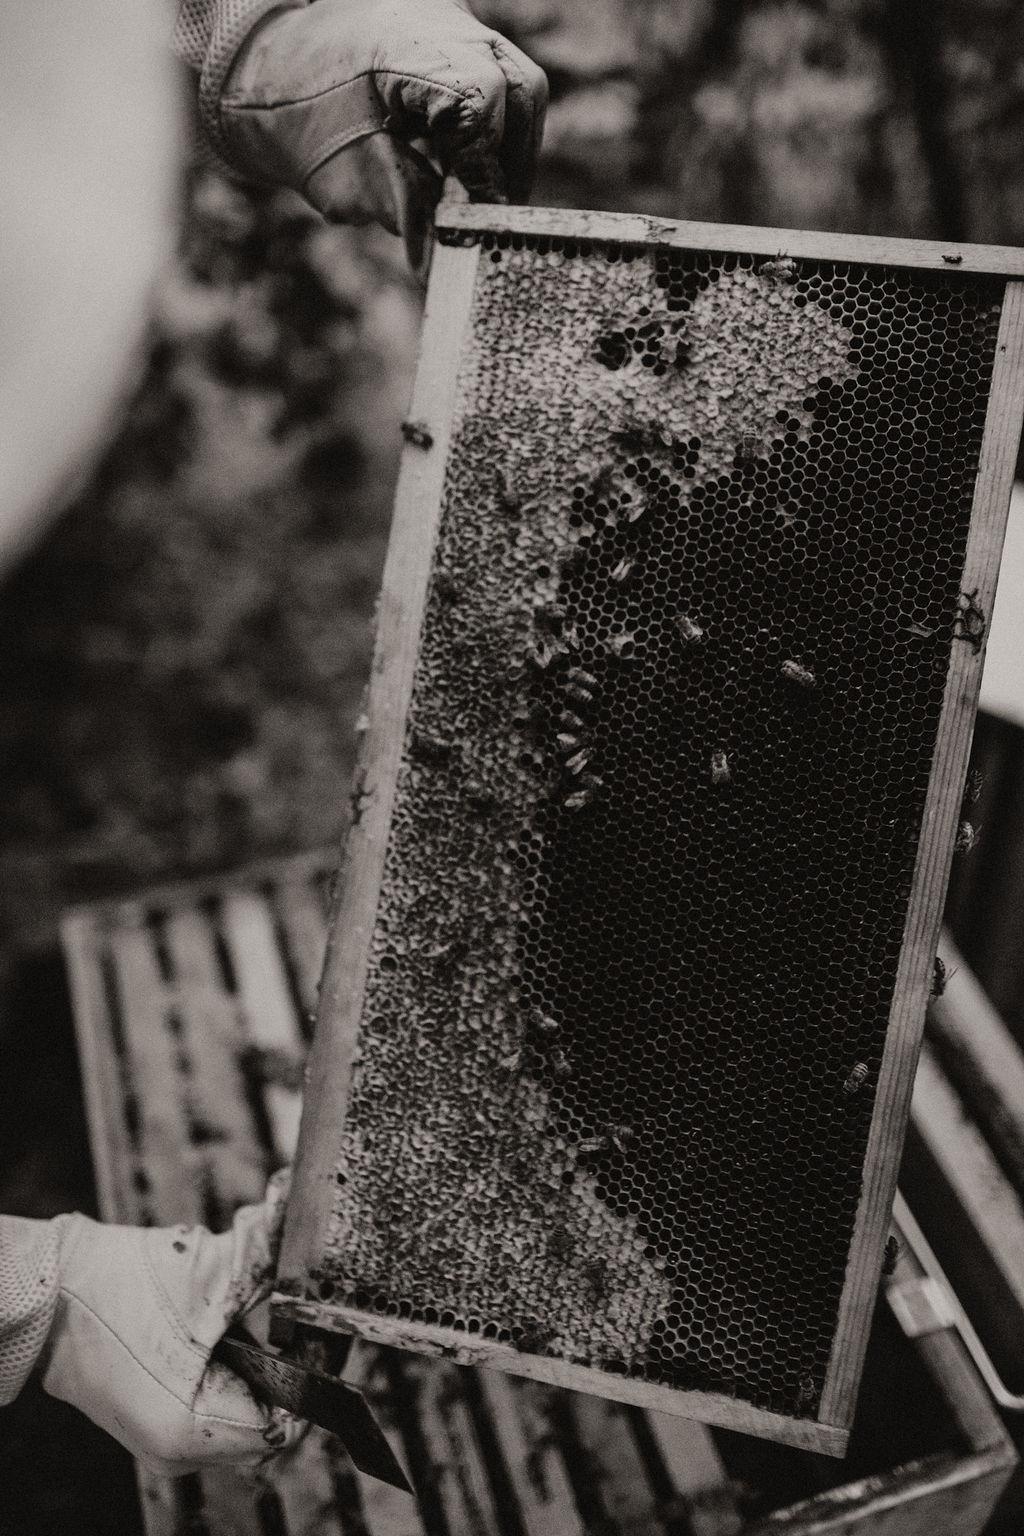 Denver Wedding Photographer, Colorado Wedding Photographer, Redden Photography, Redden, Denver Engagement Photographer, Colorado Engagement Photographer, Colorado Photographer, Denver Photographer, Buena Vista Photographer, Buena Vista Wedding, Surf Hotel Wedding, Beekeeper Wedding, Velvet Wedding Dress, Wedding Dresses that aren't white, Green Wedding Dress, Green Wedding Shoes, Surf Hotel, Surf Hotel Buena Vista, Bridal Portrait, Half up Bridal Hair, Colorado Wedding Hair, Colorado Wedding Dress, Colorado Wedding Makeup, Floral Wedding Dress, Unique Wedding Dress, First Look, Riverside Wedding, River Wedding, Colorado First Look, Field Wedding Portraits, Grooms with Long hair, Man bun grooms, Grooms with silver hair, Wedding with Dogs, Dogs at Weddings, Dog Best Man, Couples with Dogs, Couples Portraits, Buena Vista Festival Ground